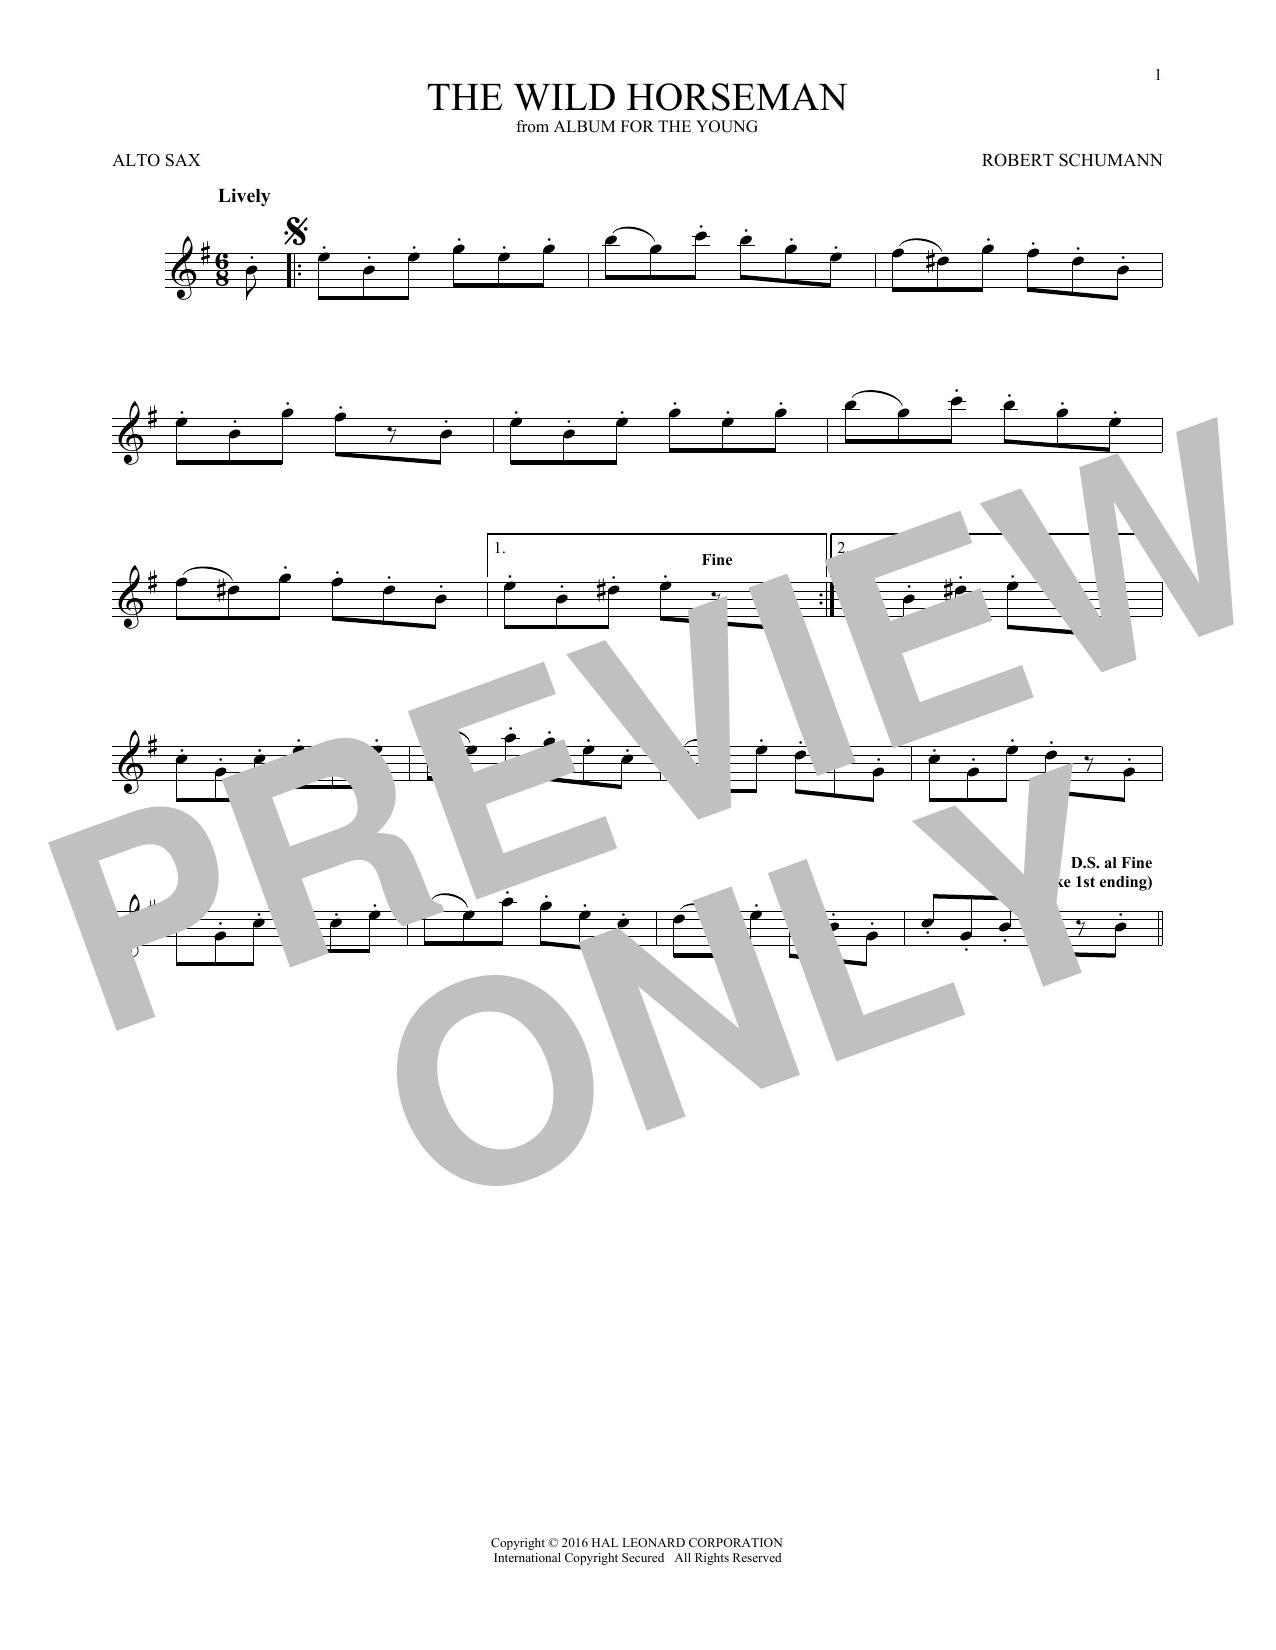 Robert Schumann The Wild Horseman (Wilder Reiter), Op. 68, No. 8 sheet music notes and chords. Download Printable PDF.